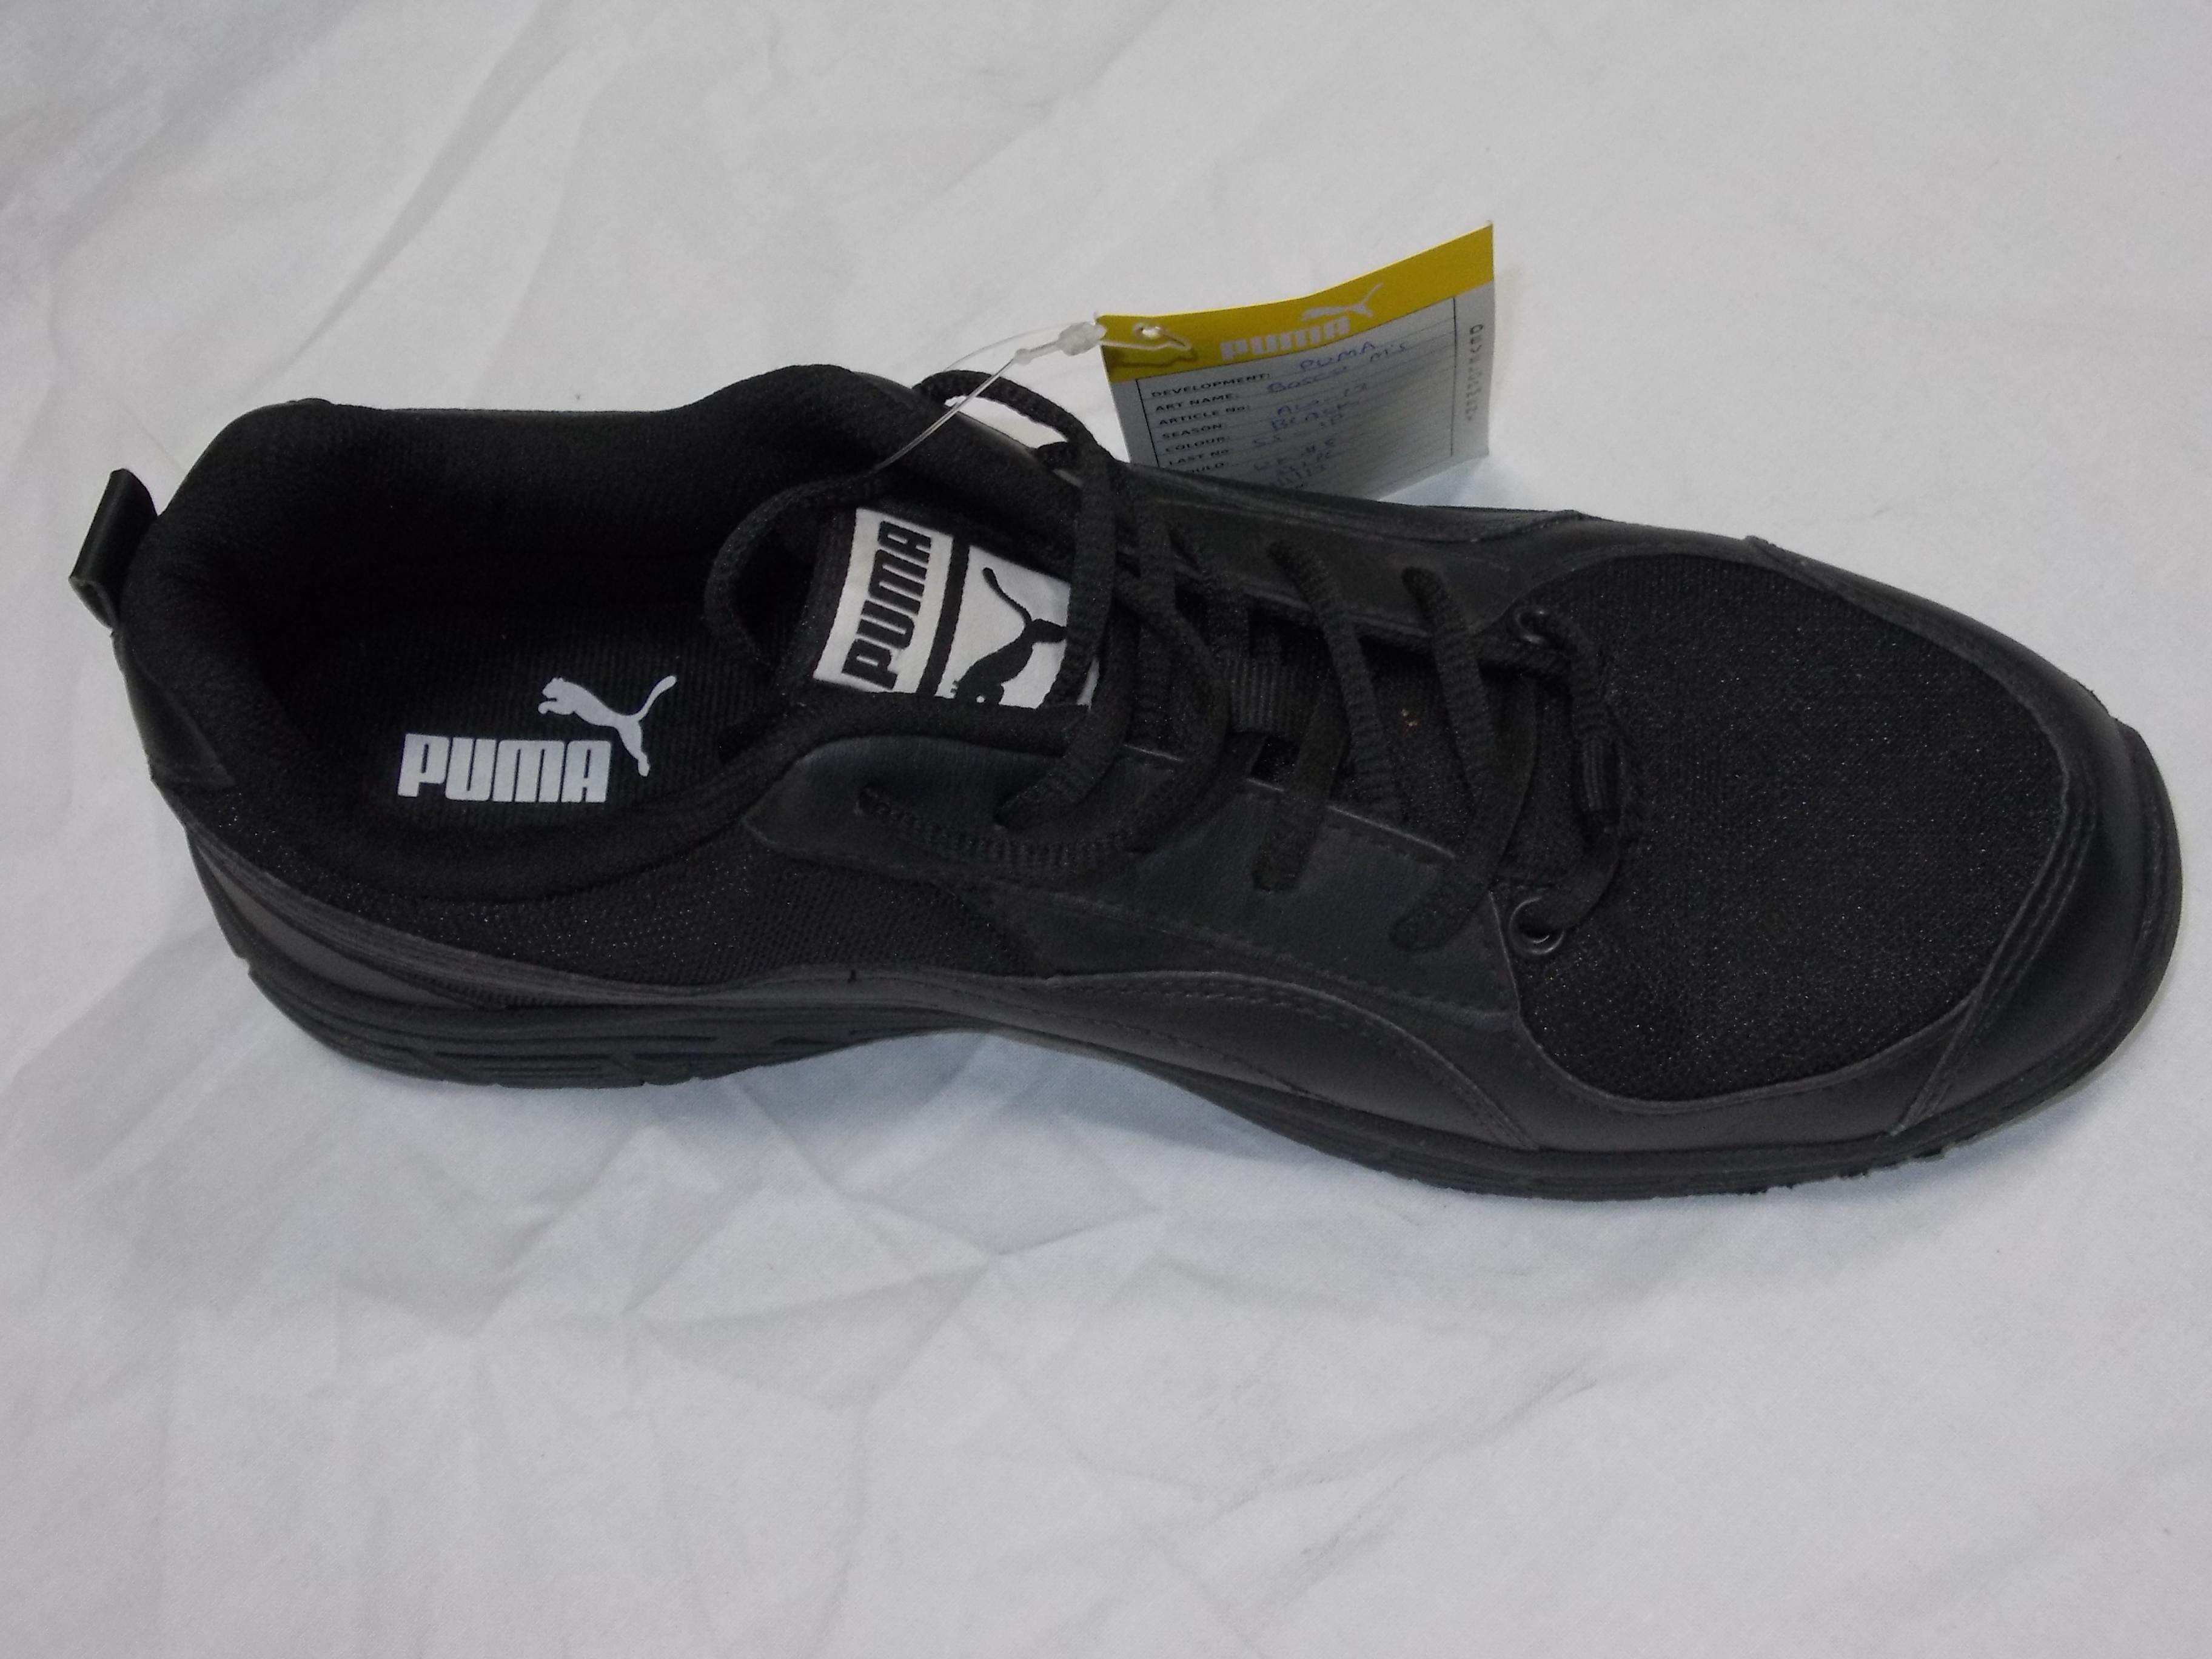 puma black school shoes Online Shopping